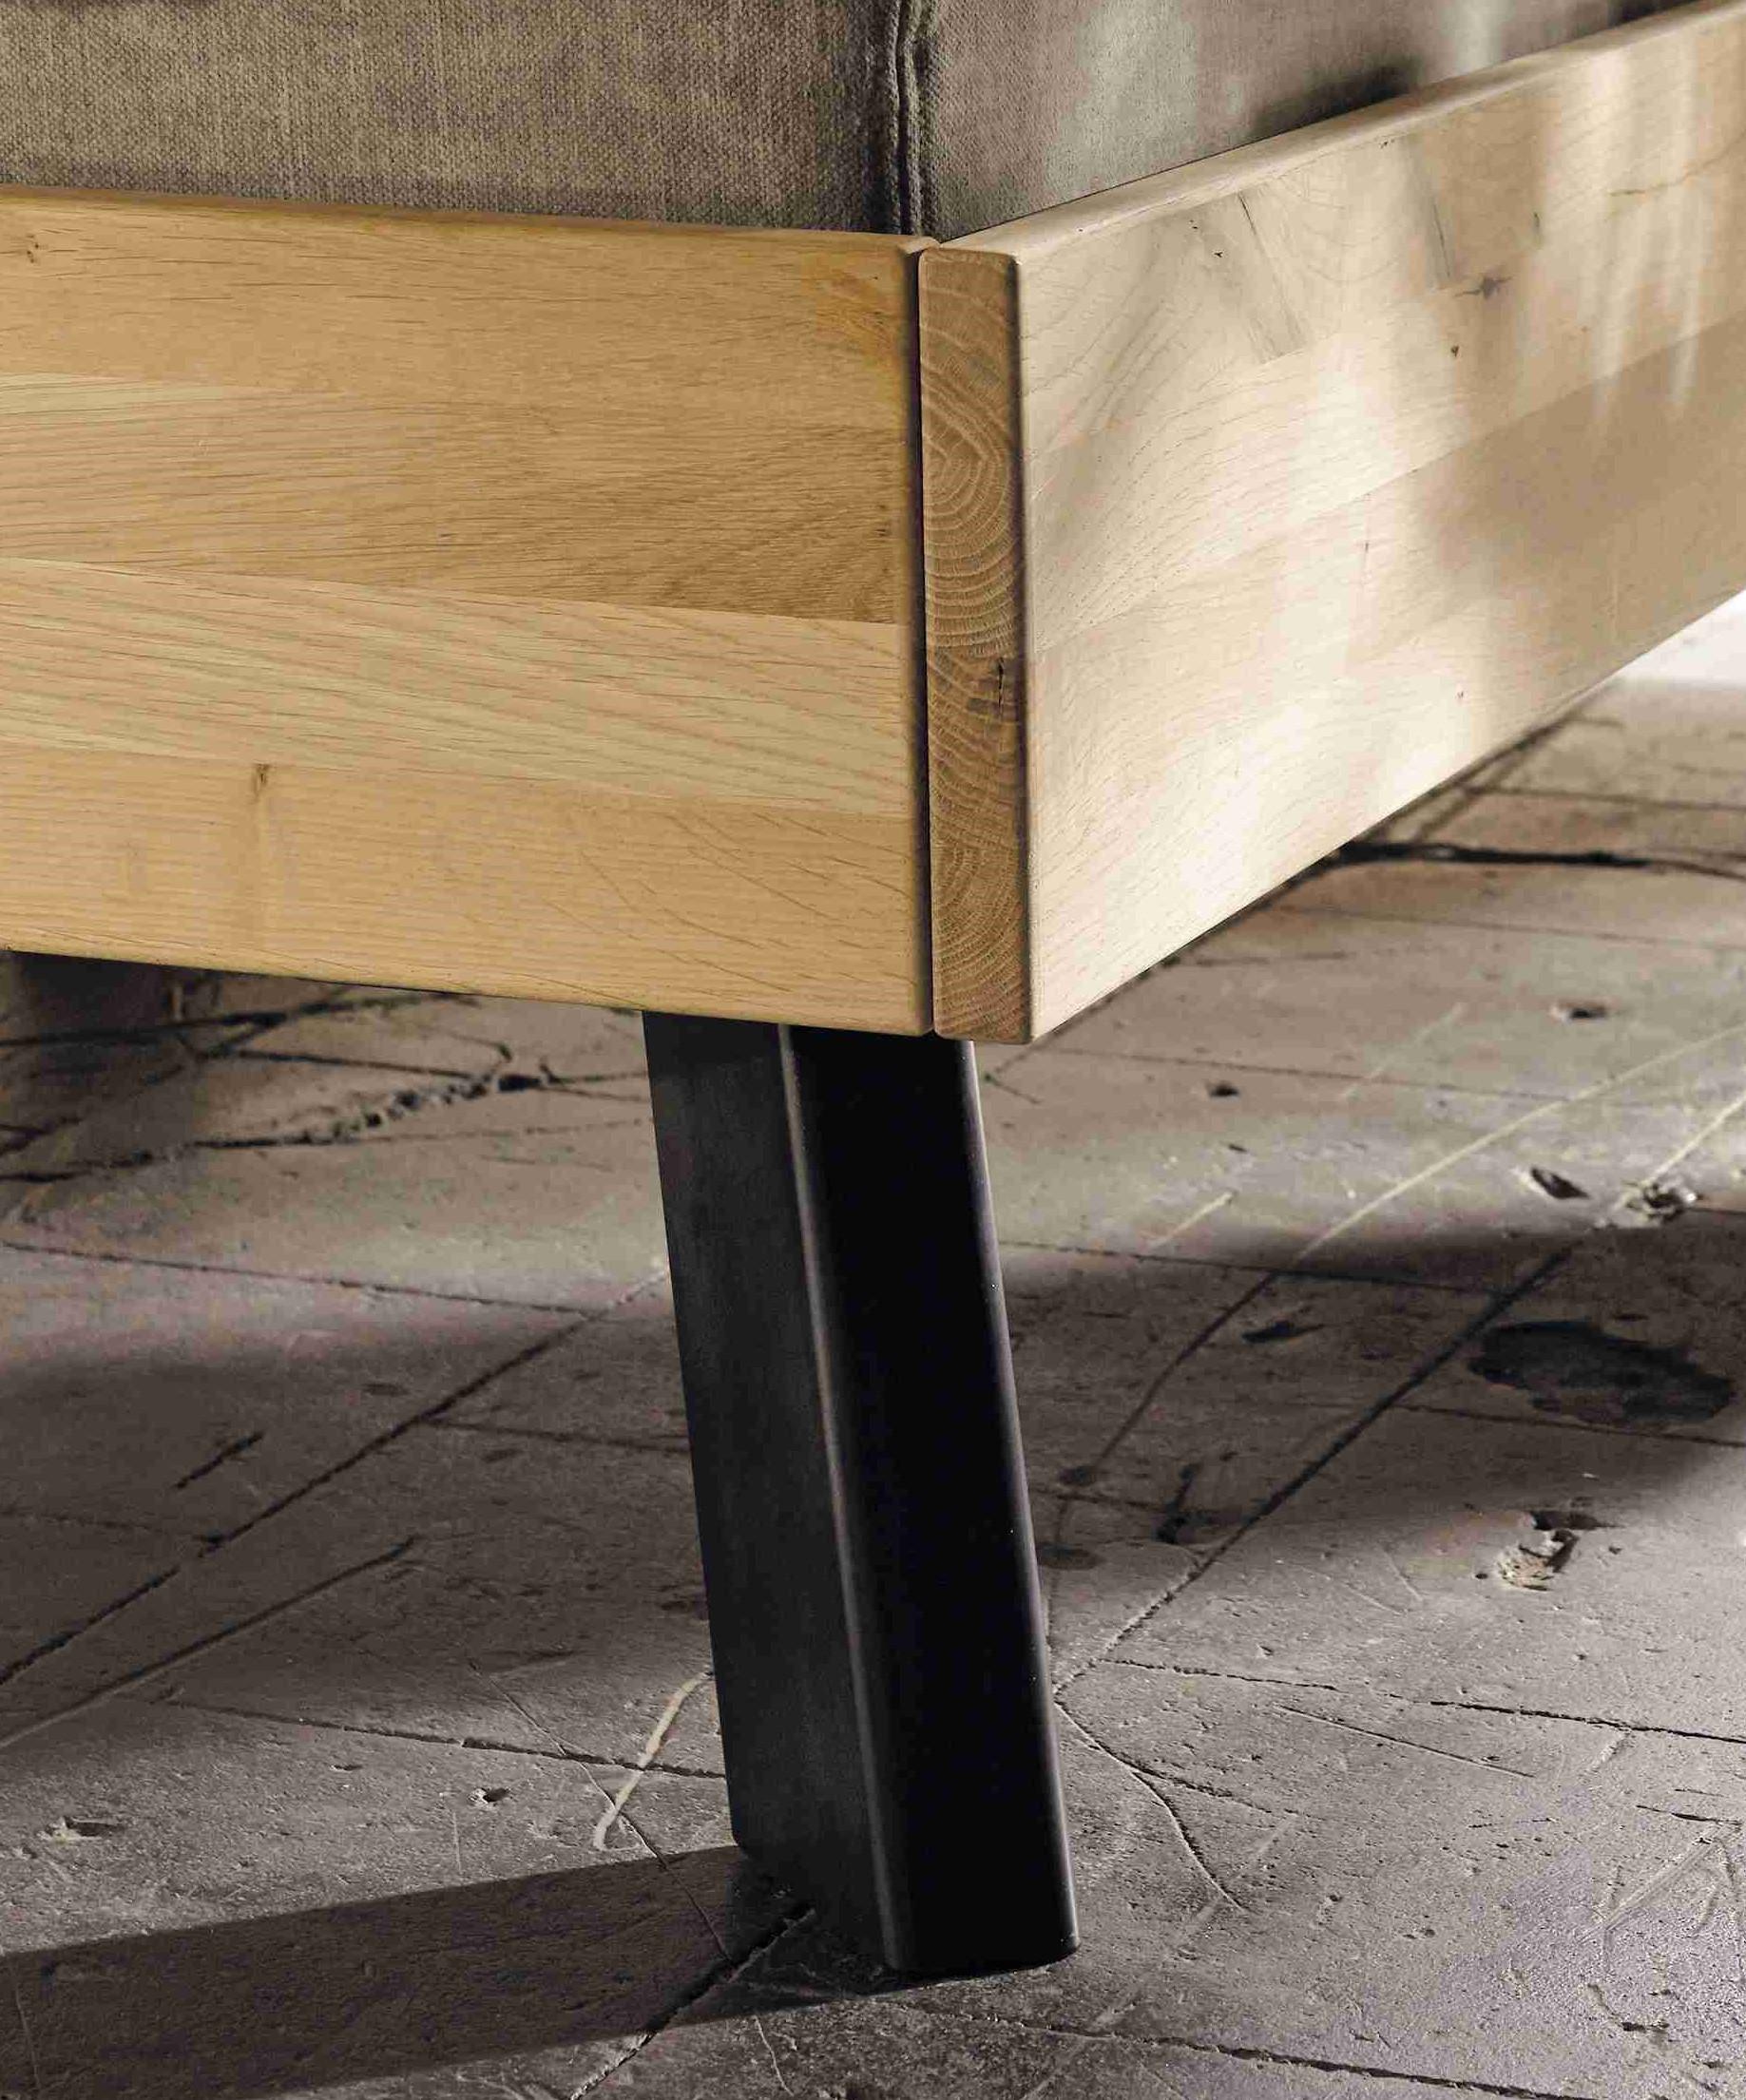 Massivholzbett Bettfüße Stahl eckig schräg